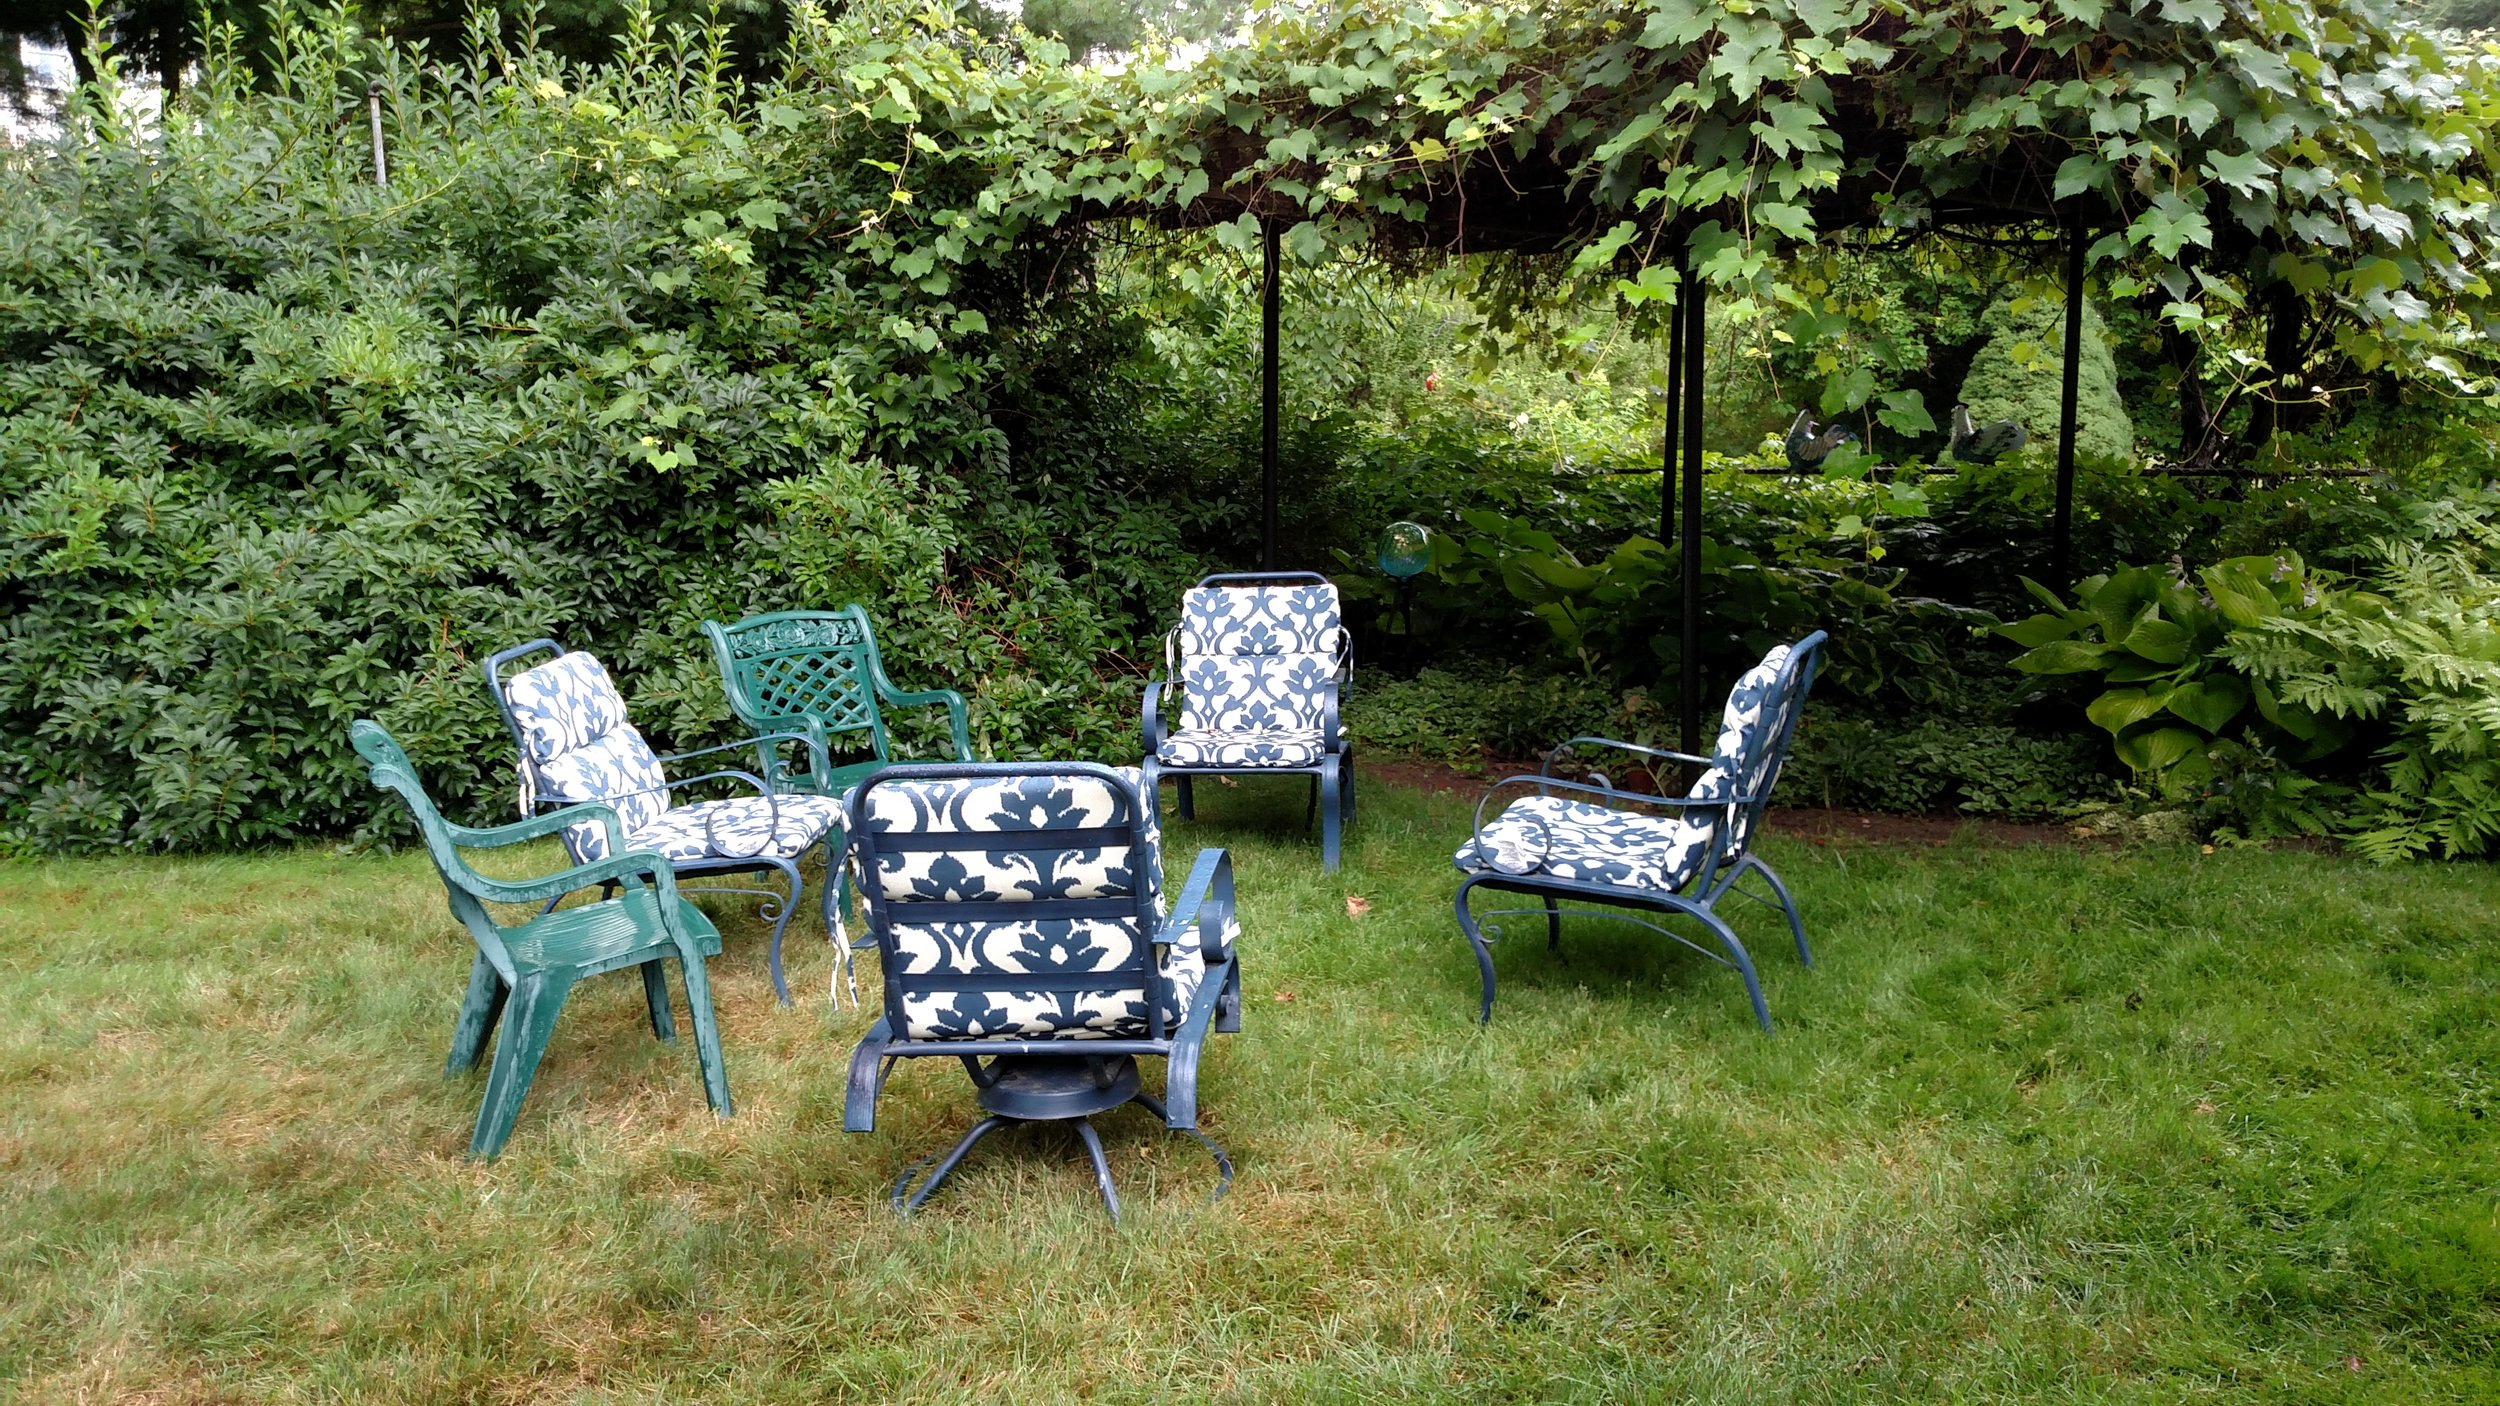 7-20-18 Shapiro Garden 12.jpg